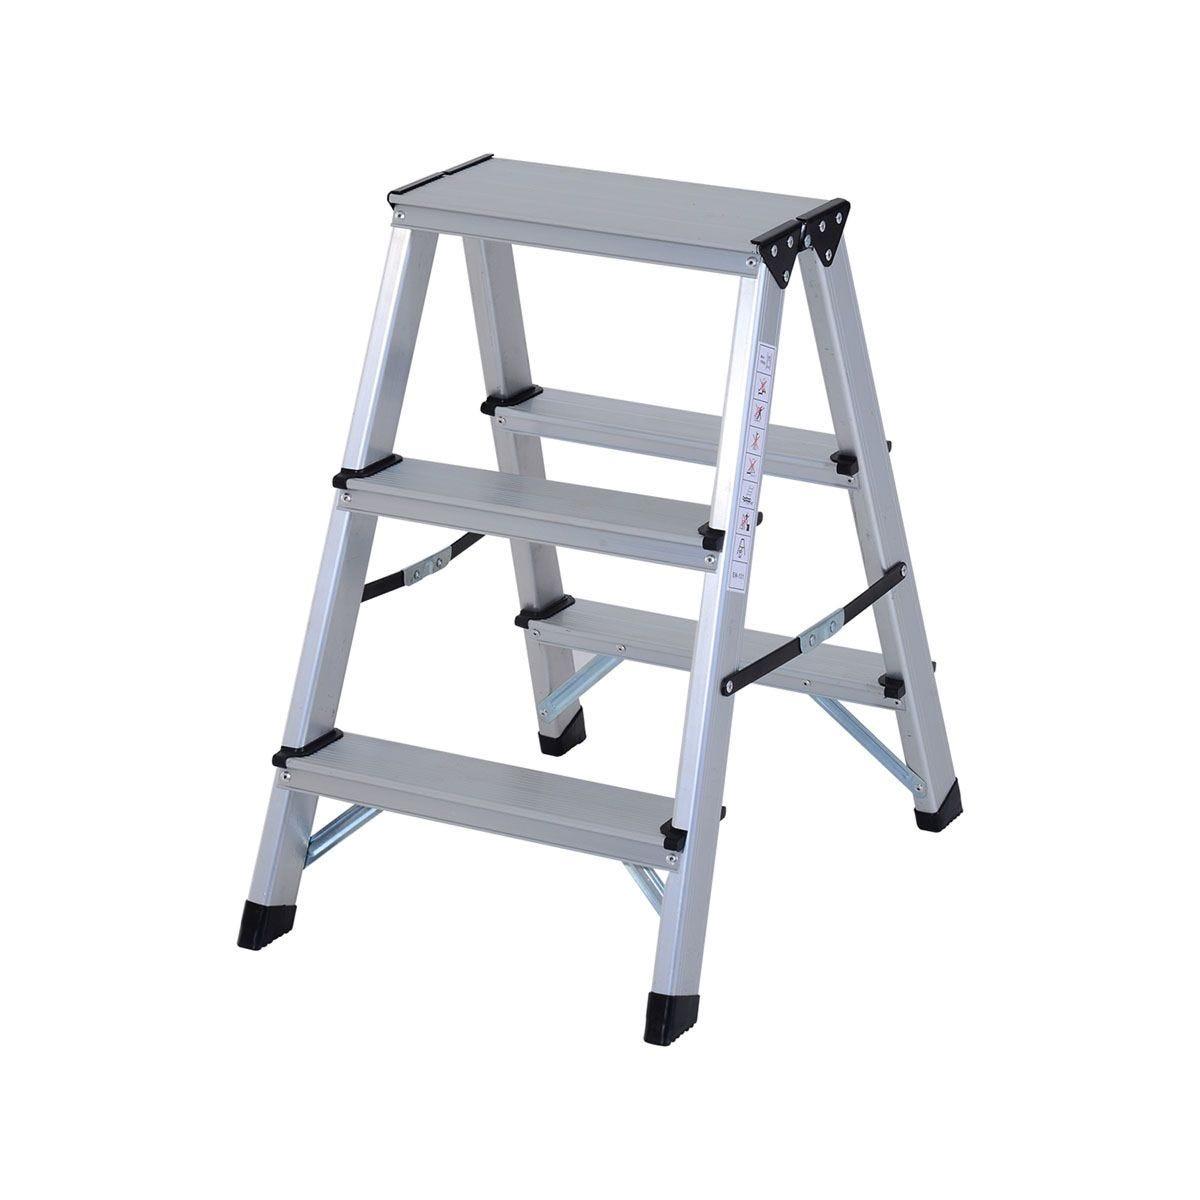 HOMCOM Foldable Aluminum Ladder A-type Multi-functional Folding 3 Steps - Silver